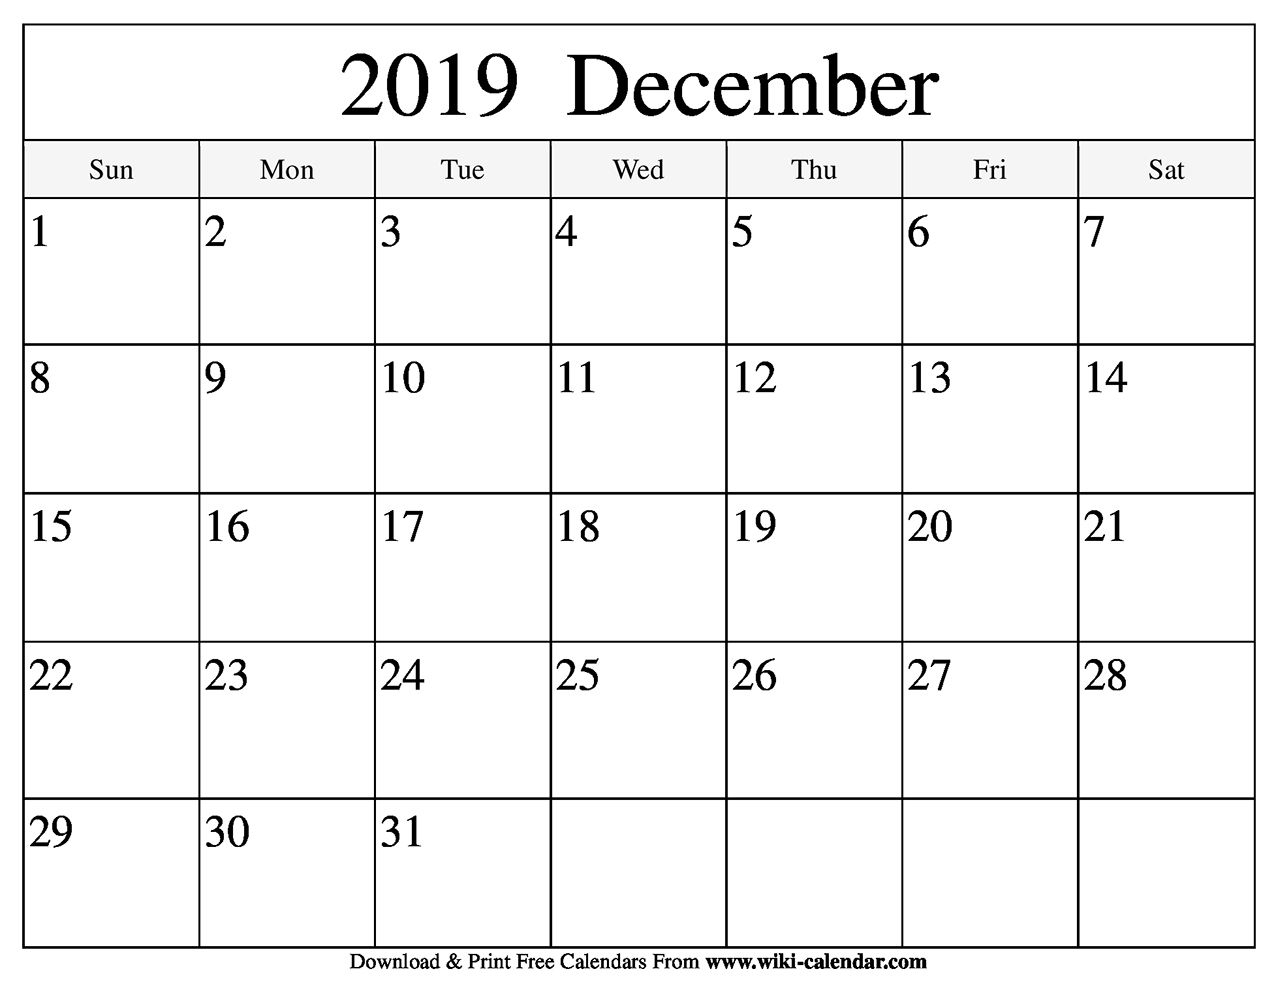 Blank December 2019 Calendar | Printable Calendar July inside 2019 Free Printable Calendars Without Downloading